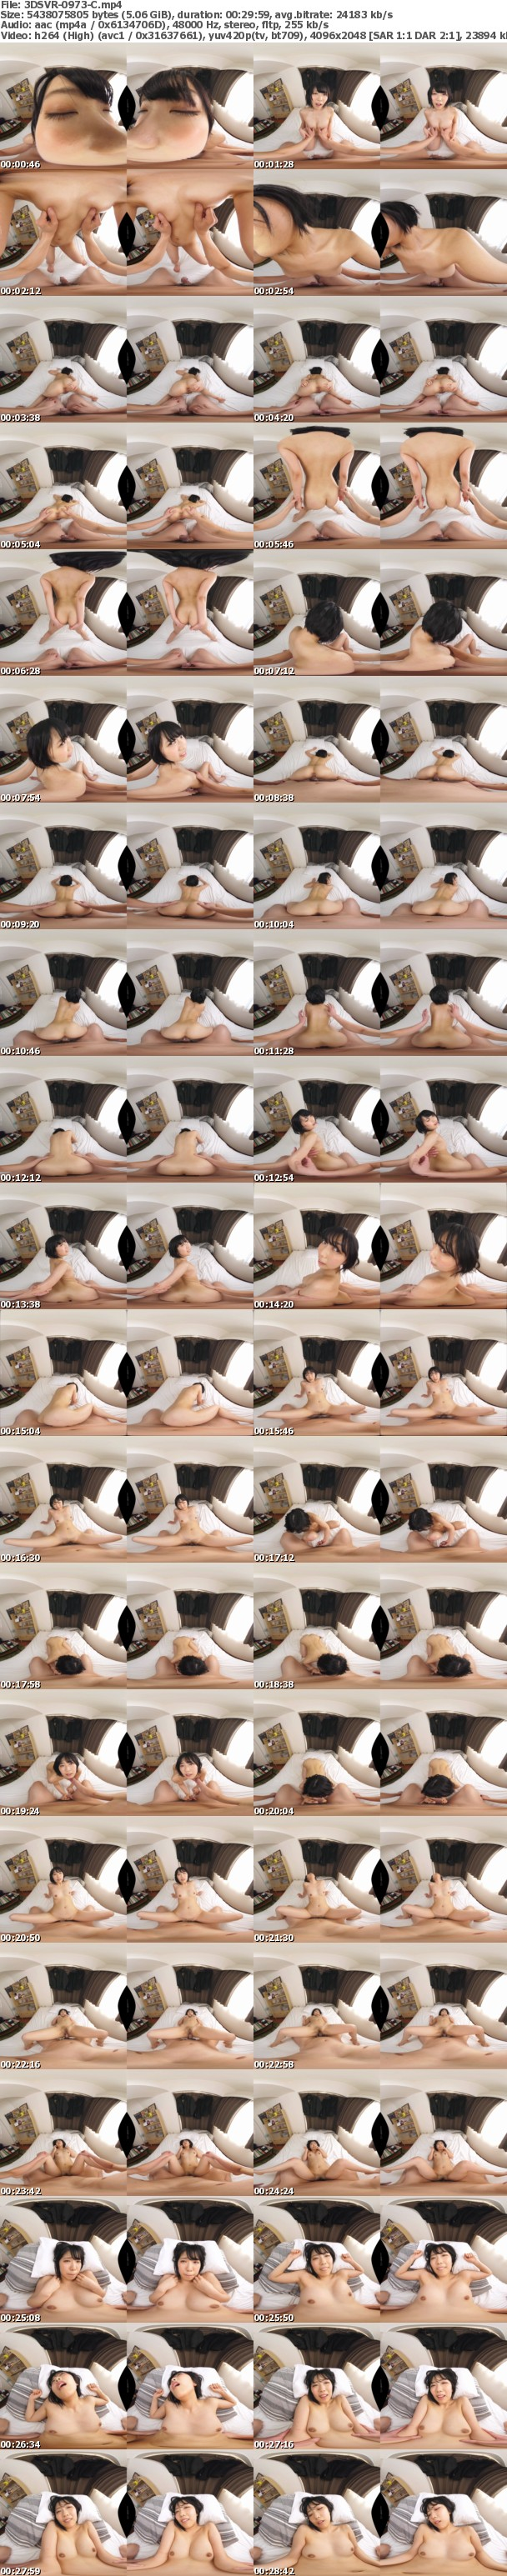 (VR) 3DSVR-0973 新人!ラッキースケベ配達員VR~遅刻してきたド緊張新人バイトちゃんは、ドM性癖を拗らせたちょっぴり変態な女子大生!?